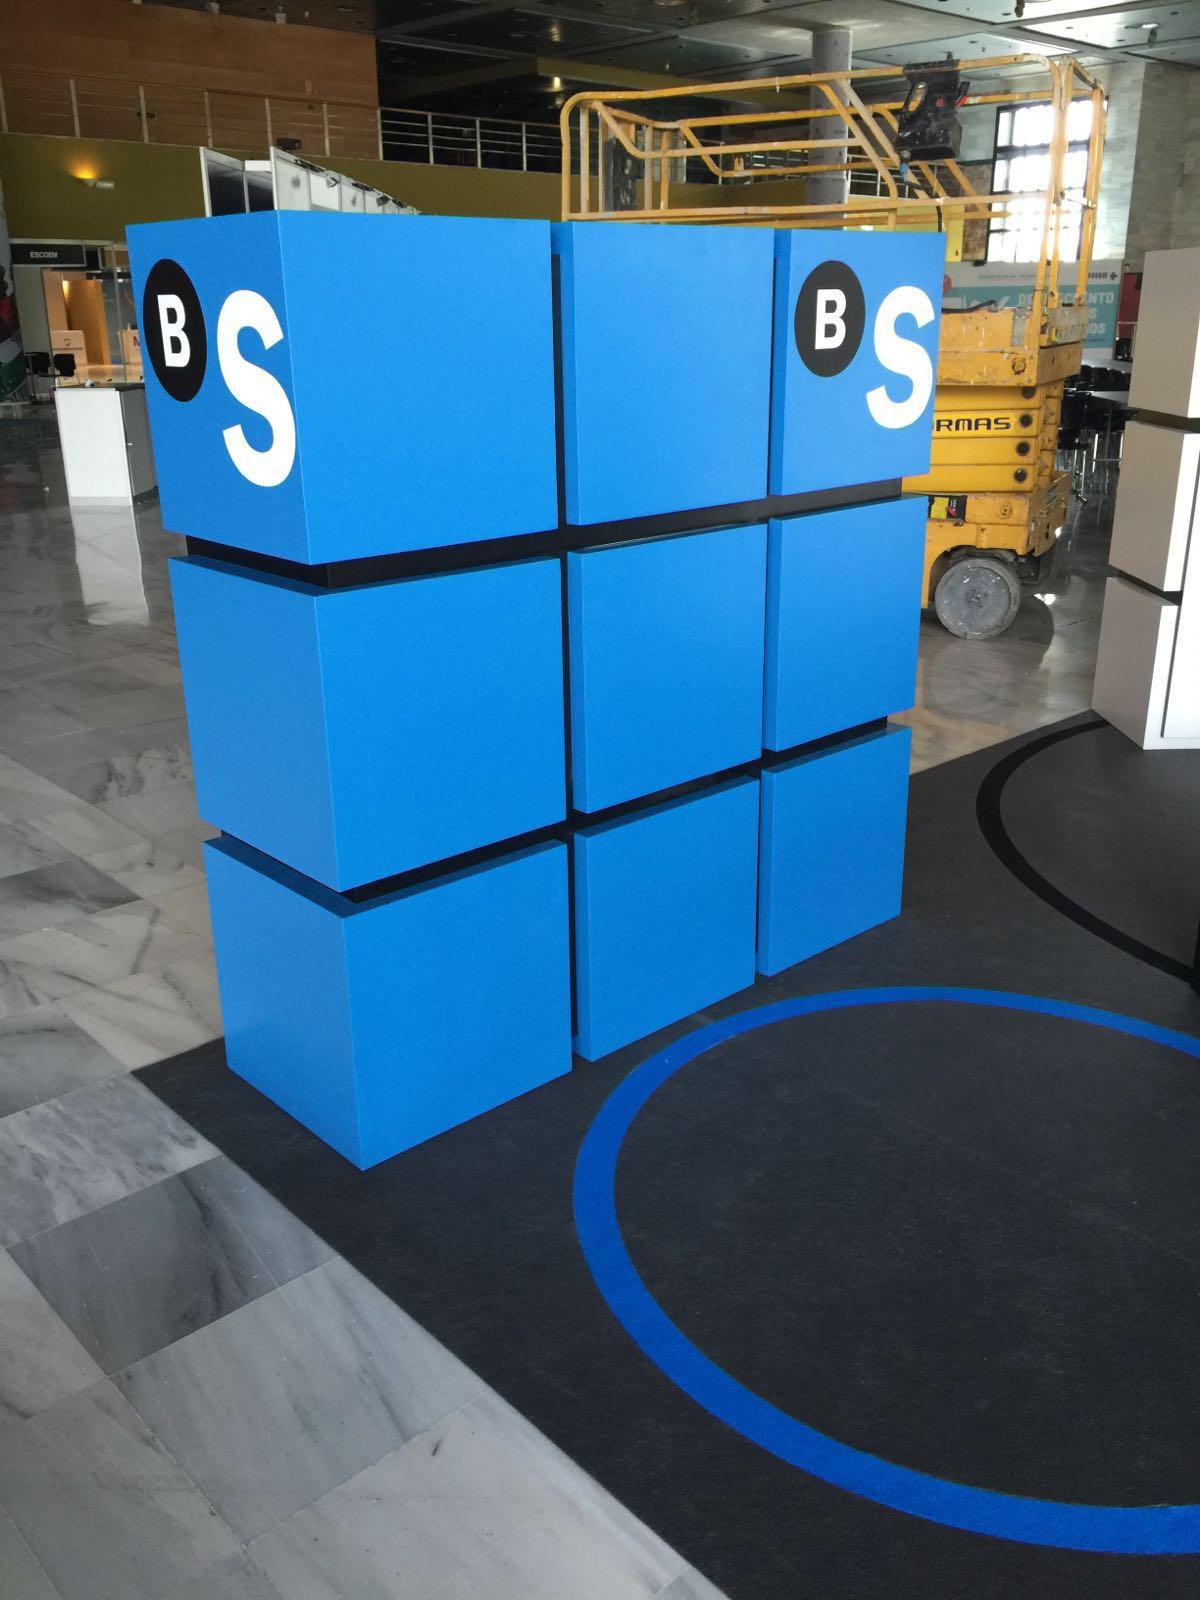 Stand Banc Sabadell